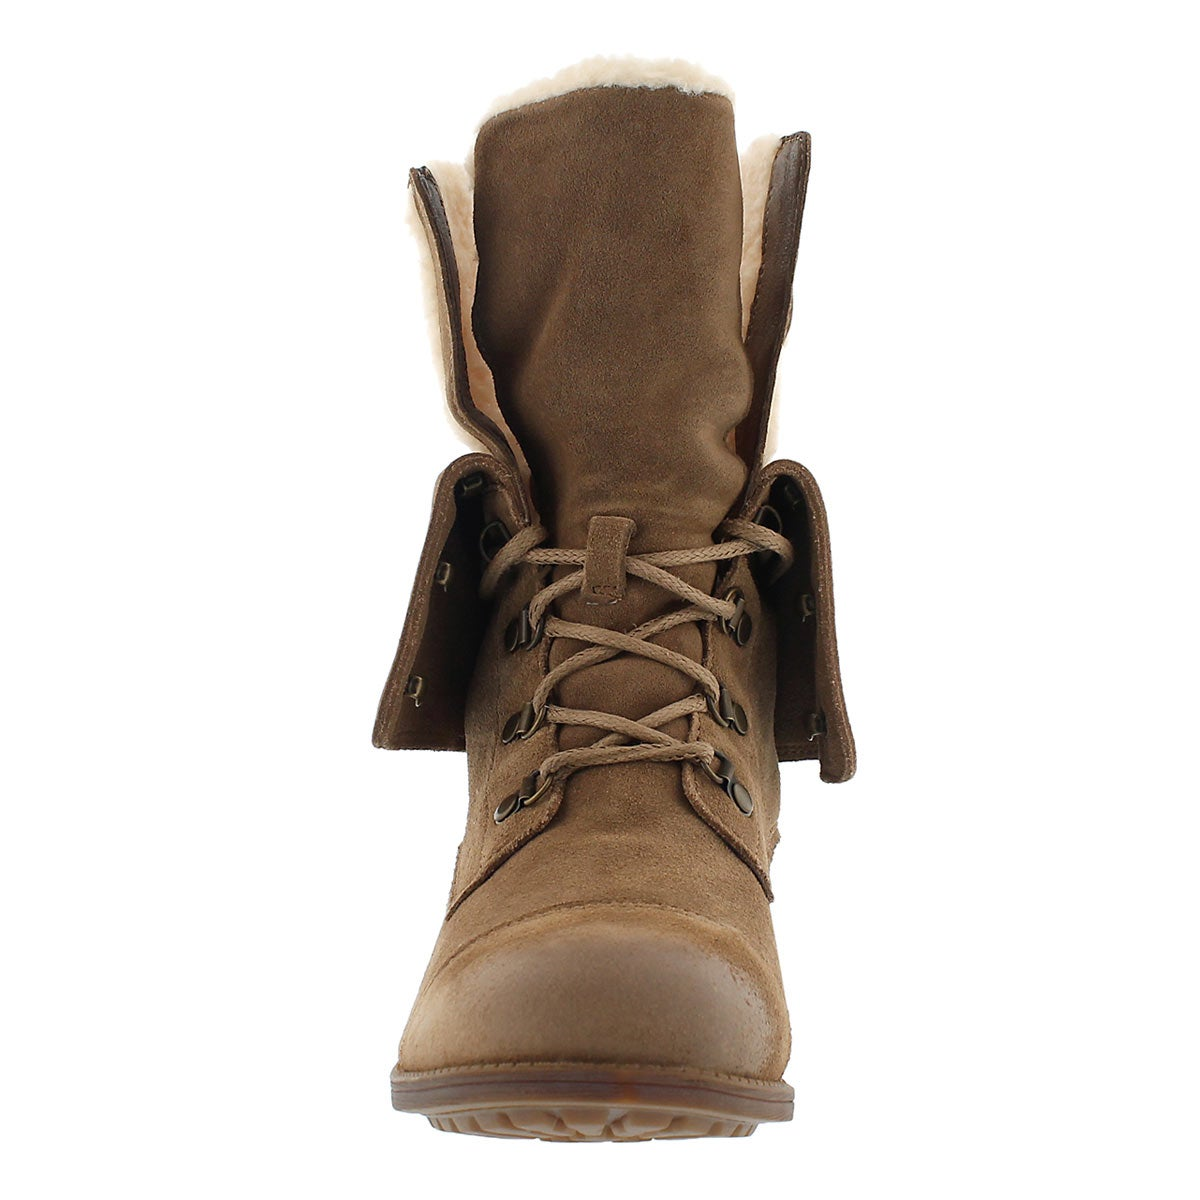 Lds Gradin dk chestnut casual ankle boot